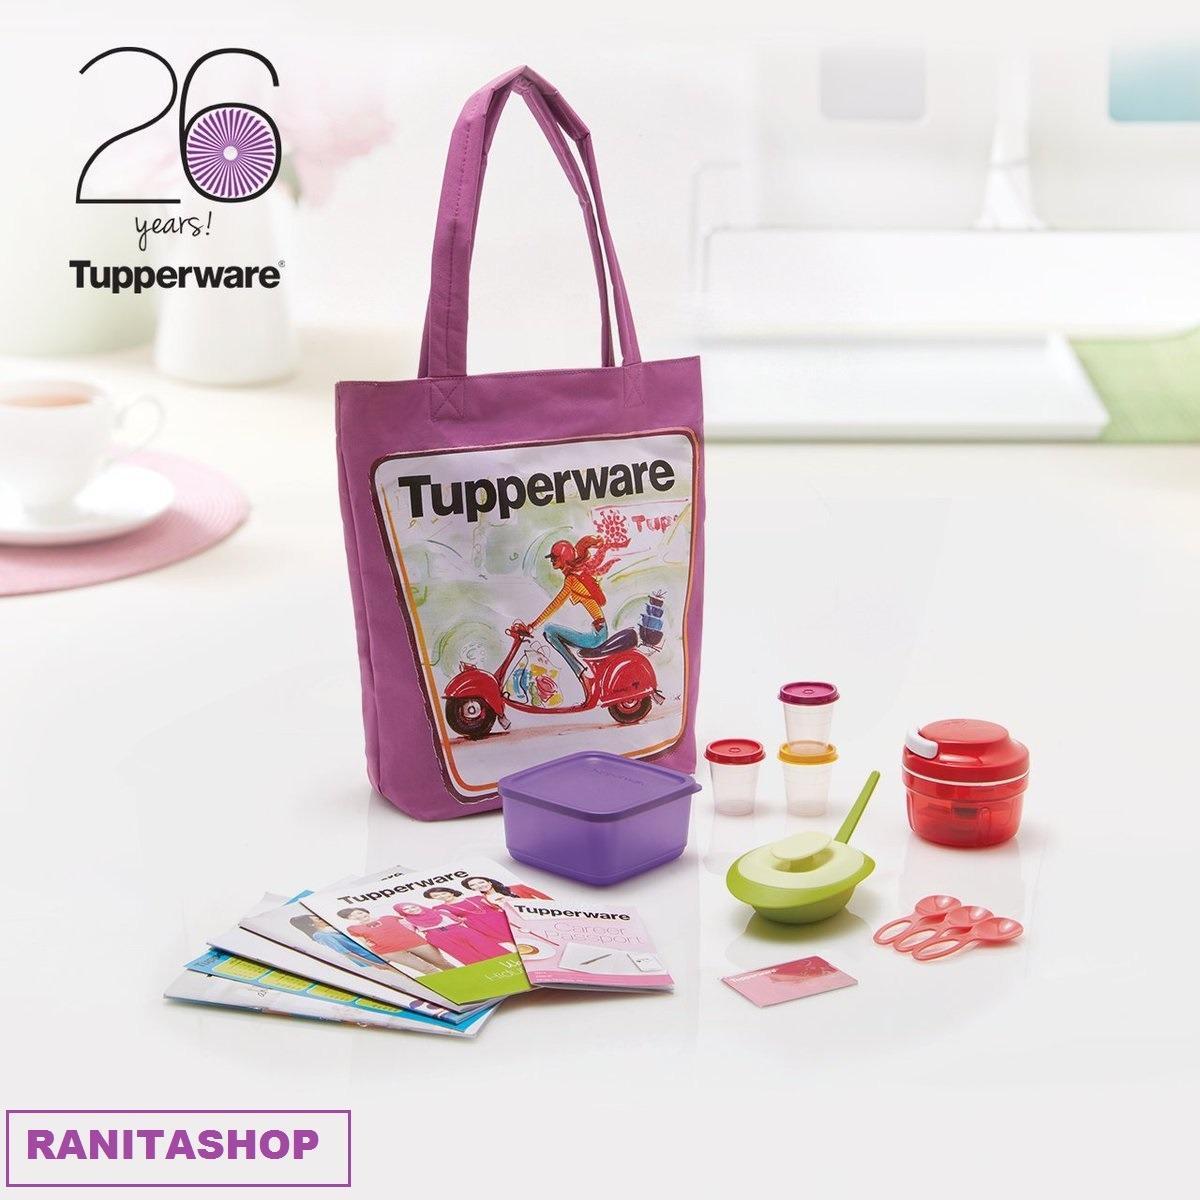 Tupperware Member Kitbag ( Turbo Chopper + Sambal Dish + Small Summer Fresh + Midget + small spoon + Tas )